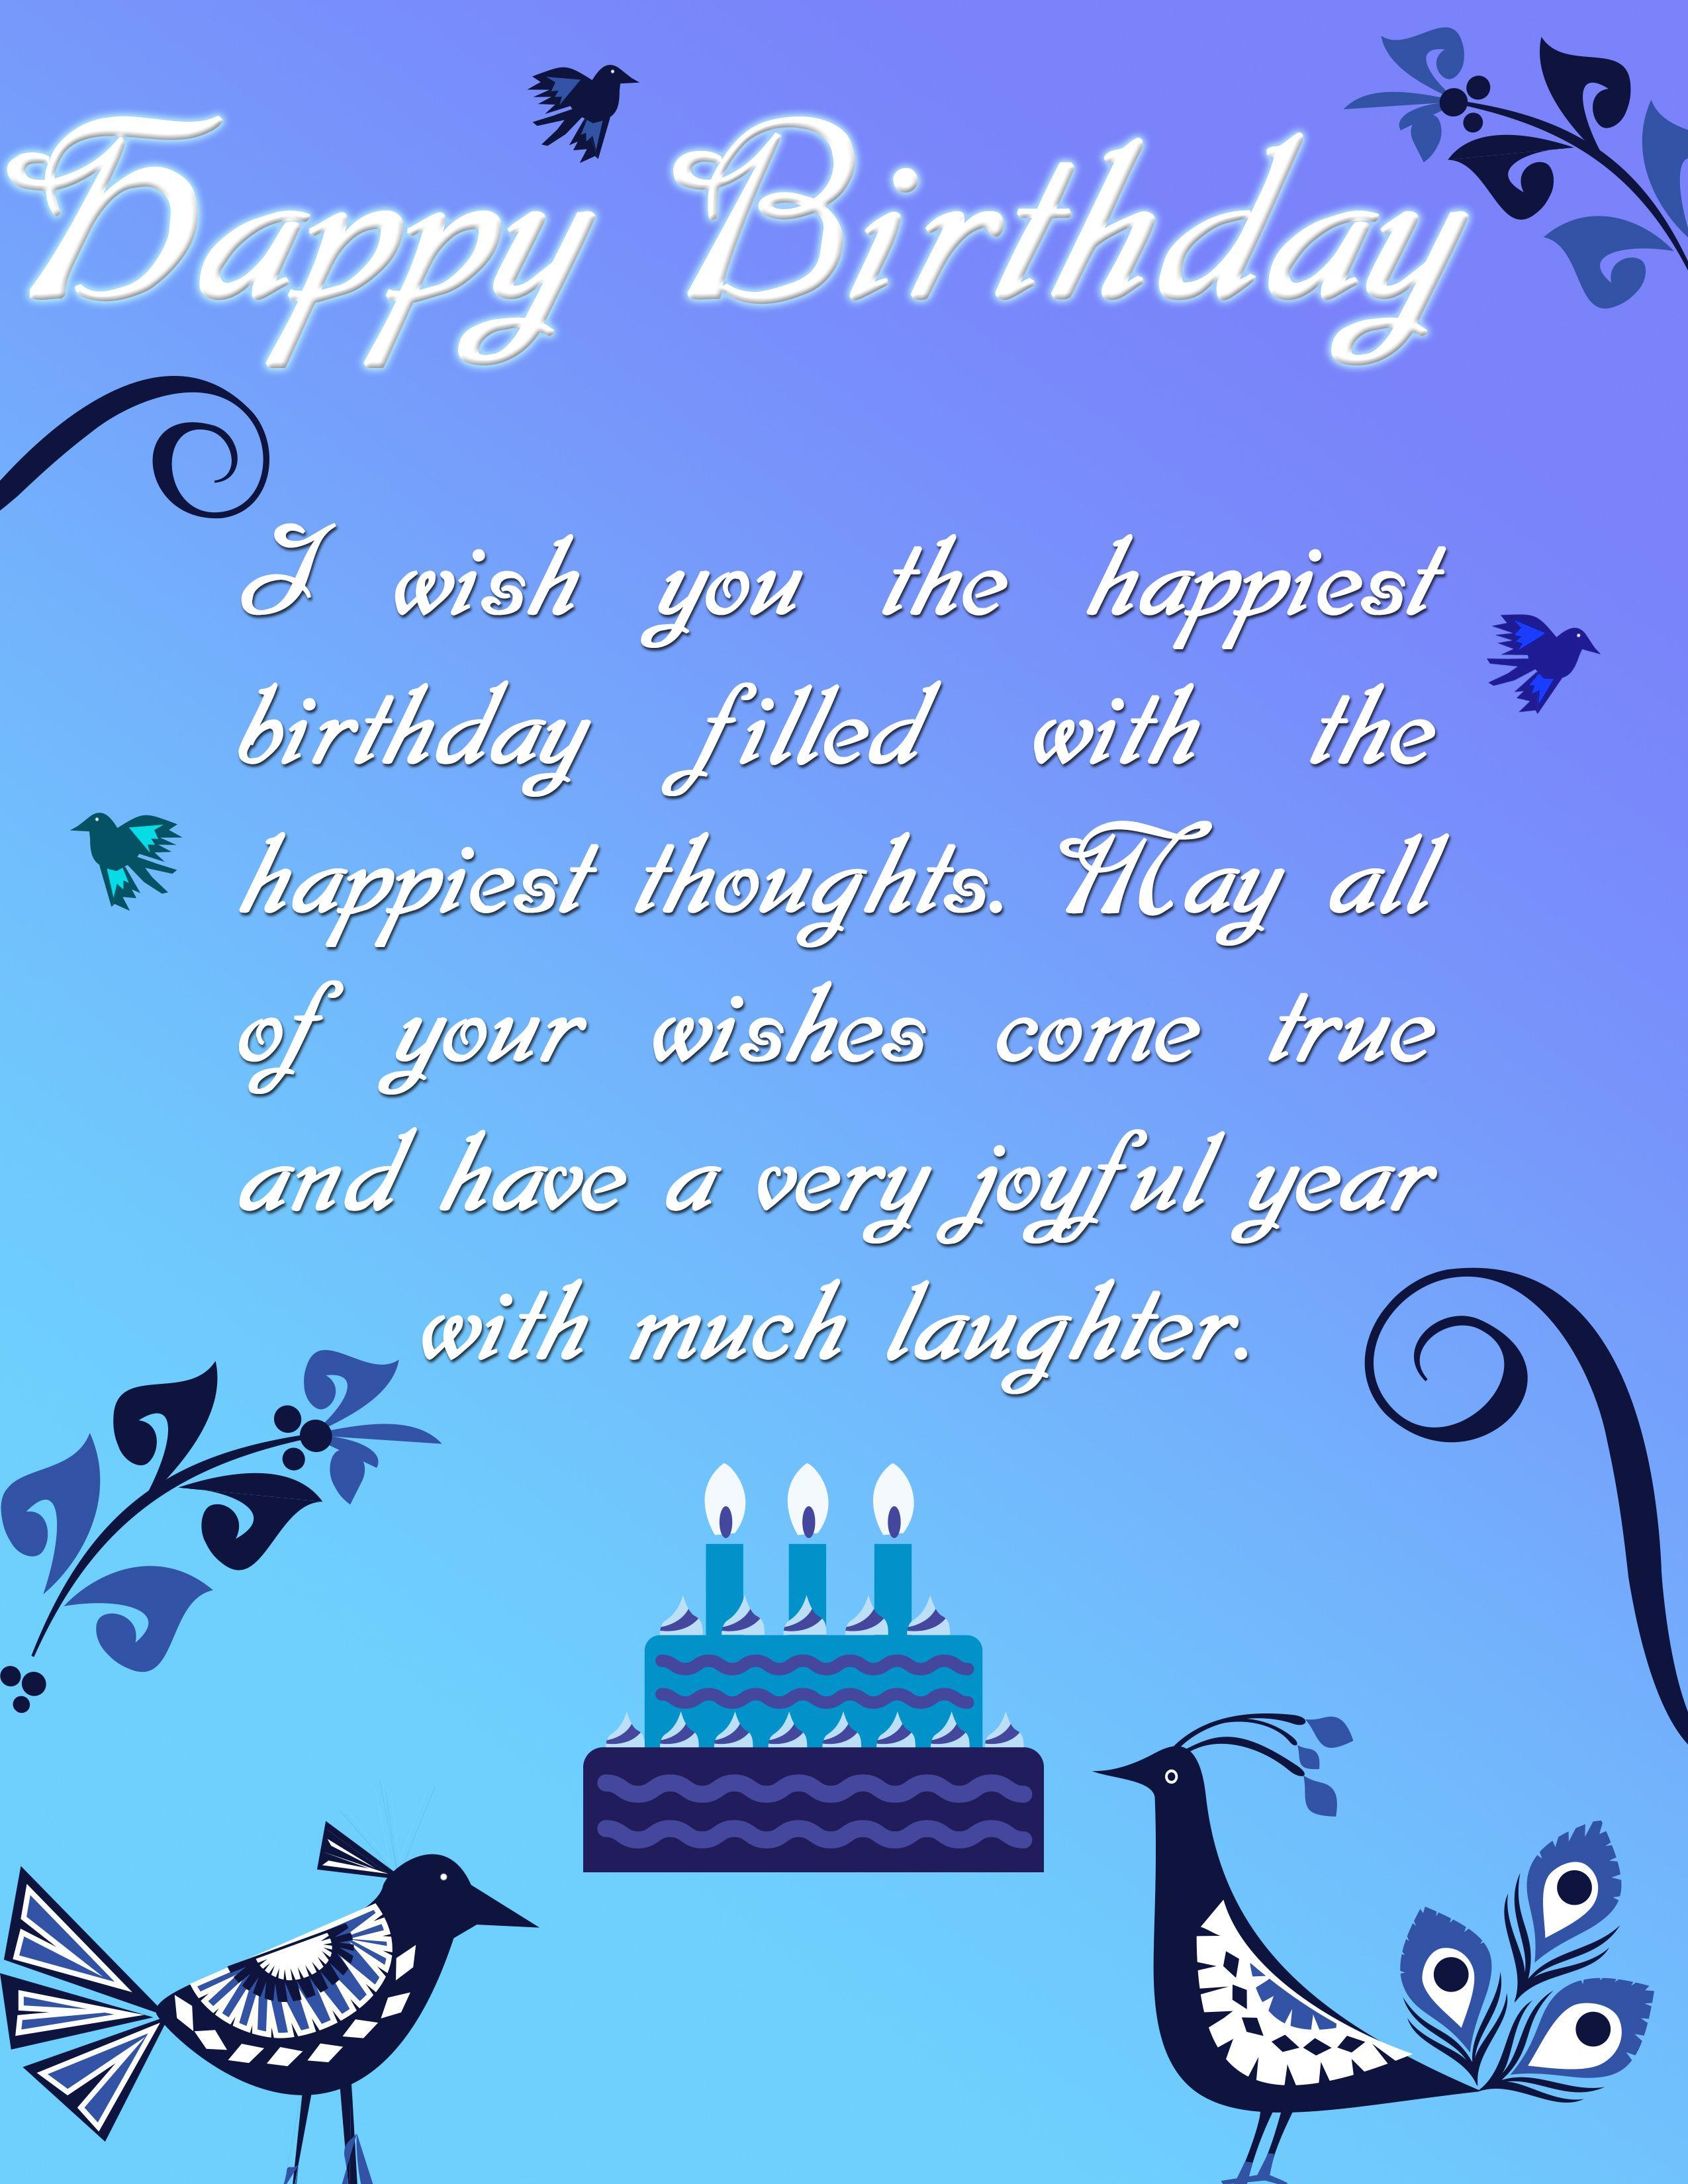 Happy Birthday Ecard original (20).jpg 2,550×3,300 pixels